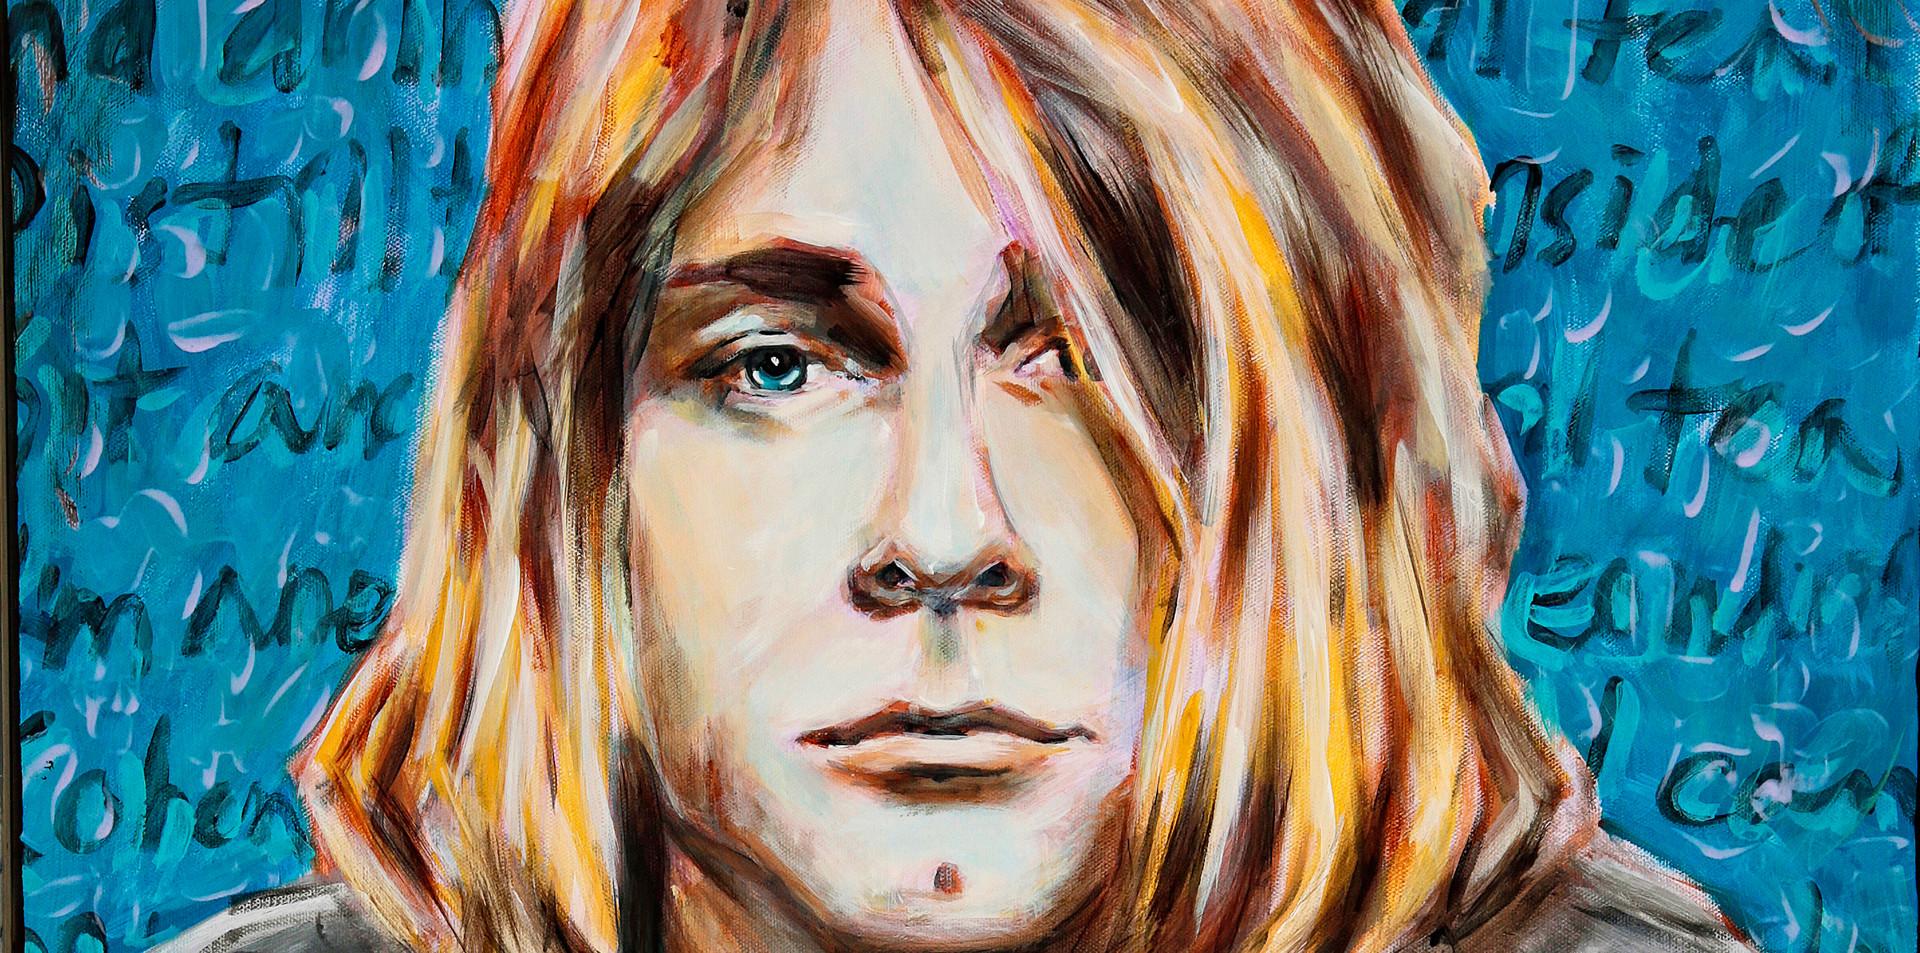 Kurt's Sacred Heart